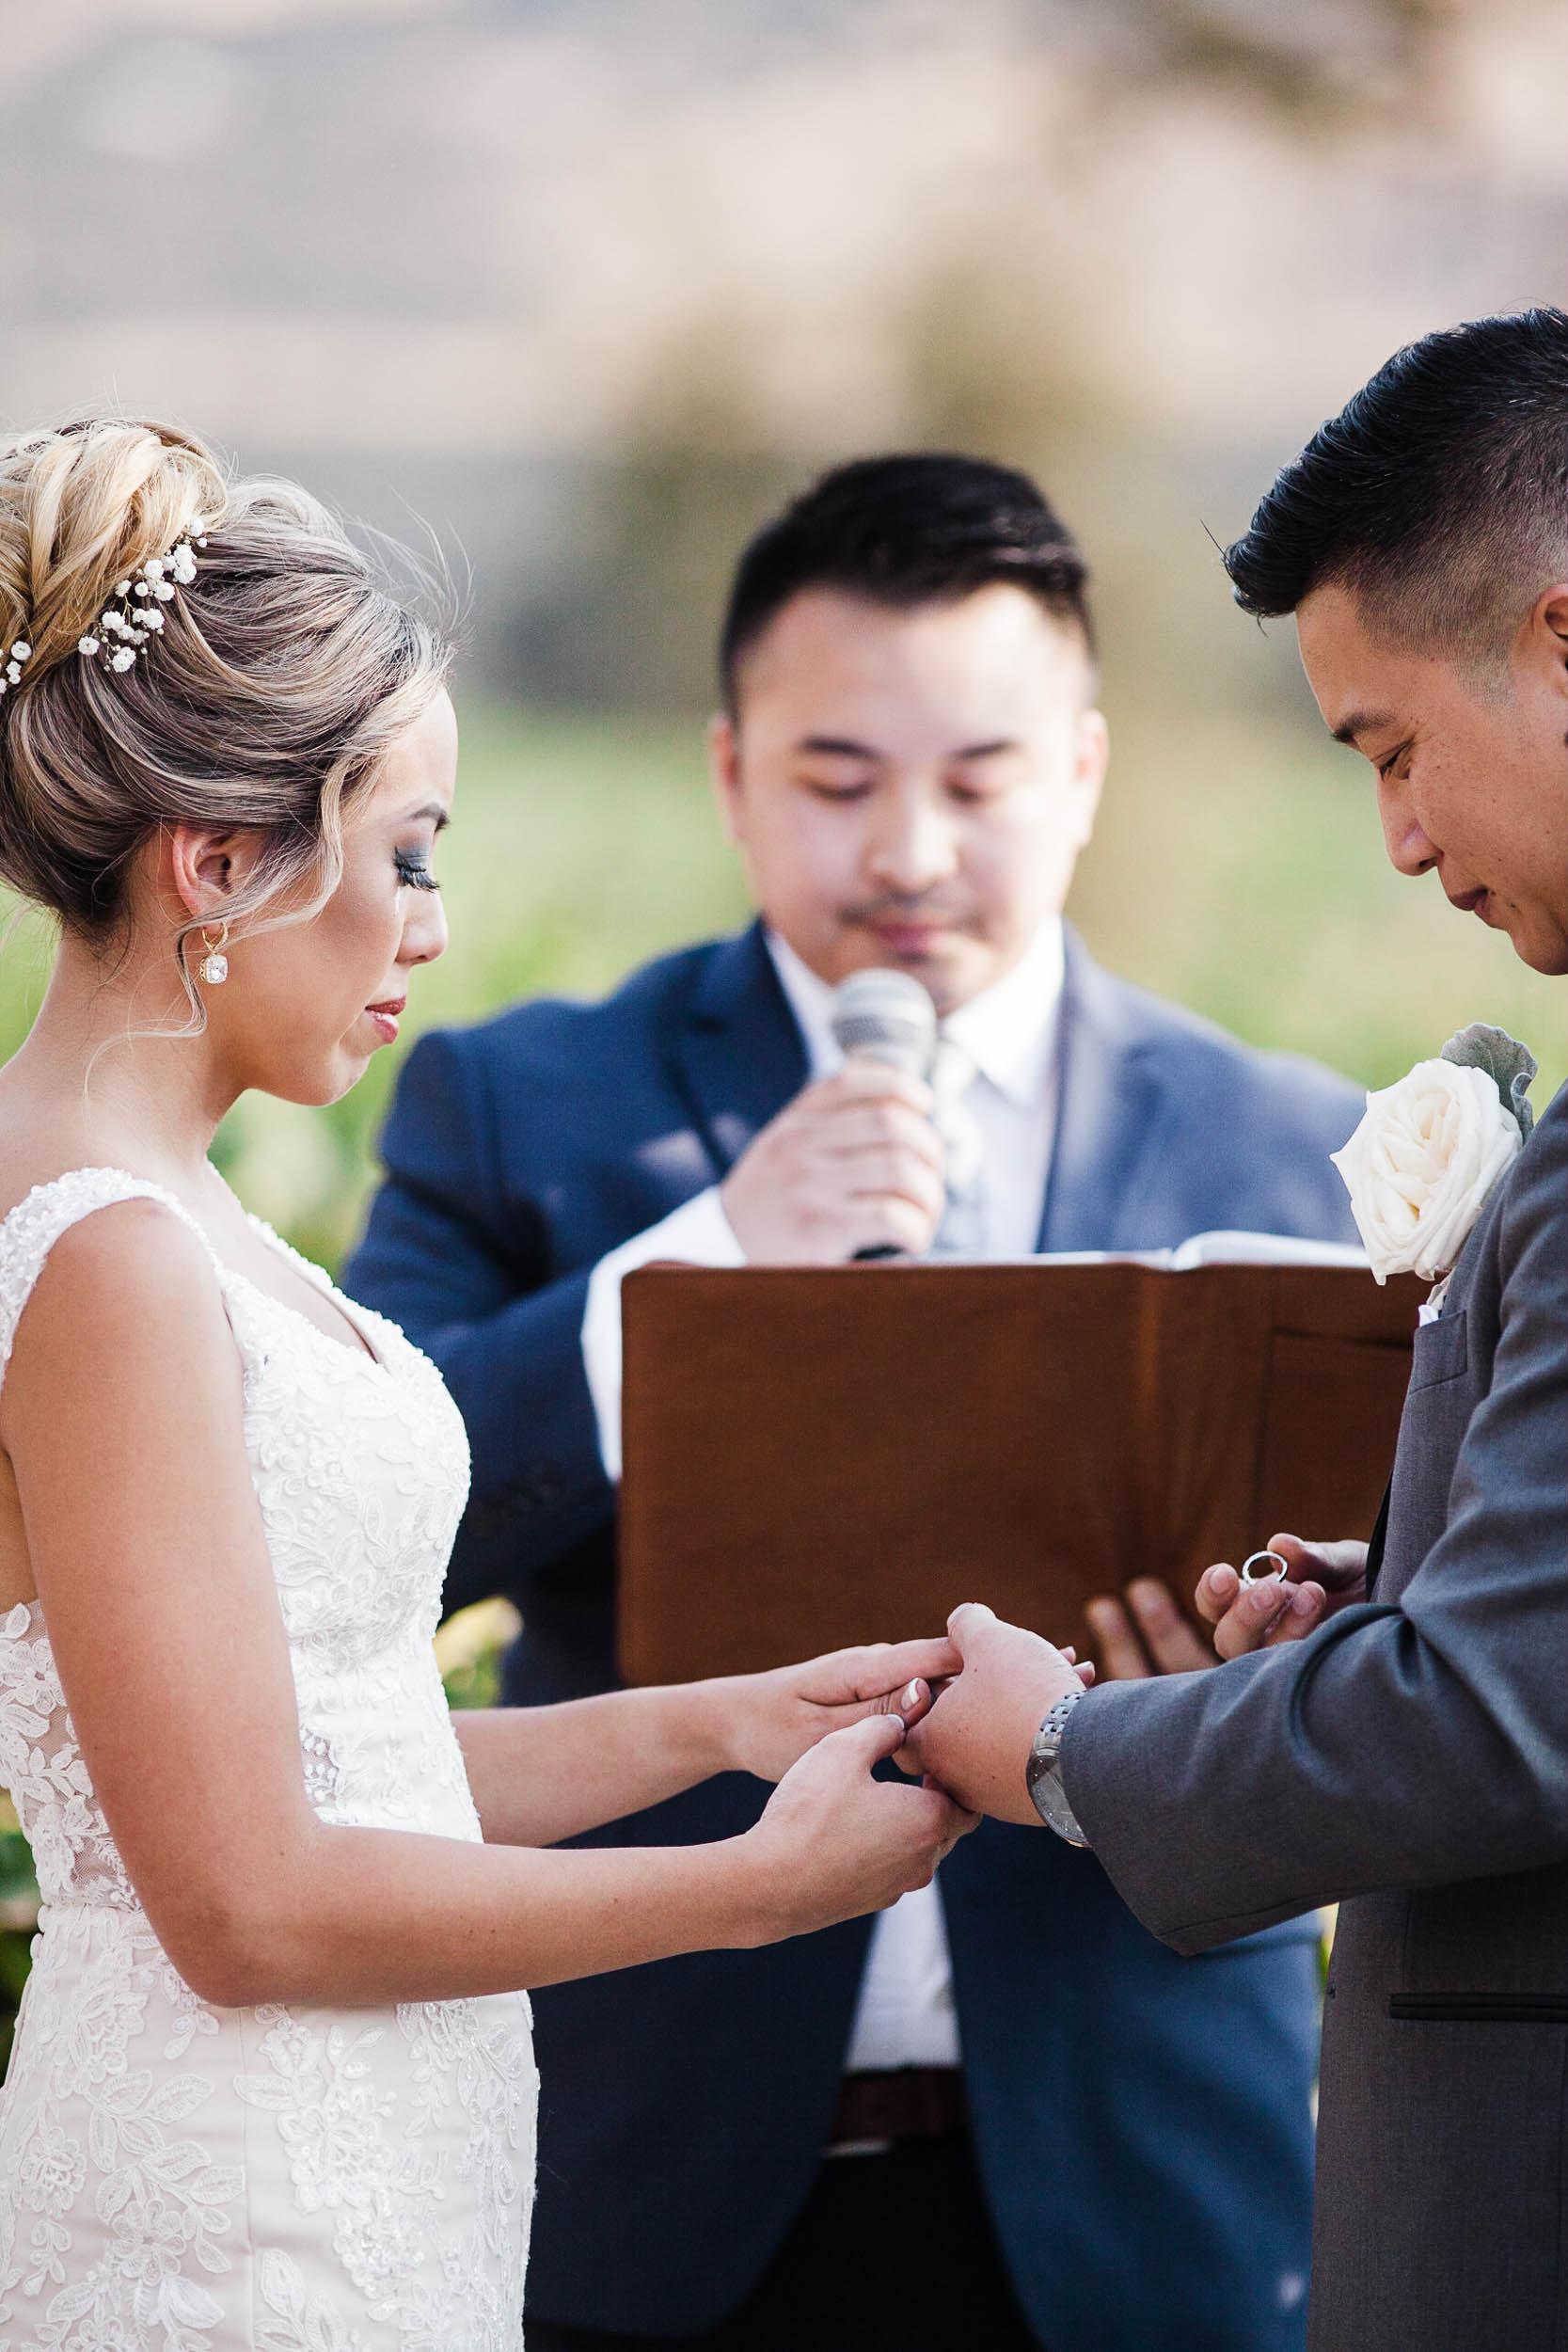 Las Positas Wedding_Buena Lane Photography_090118ER452.jpg